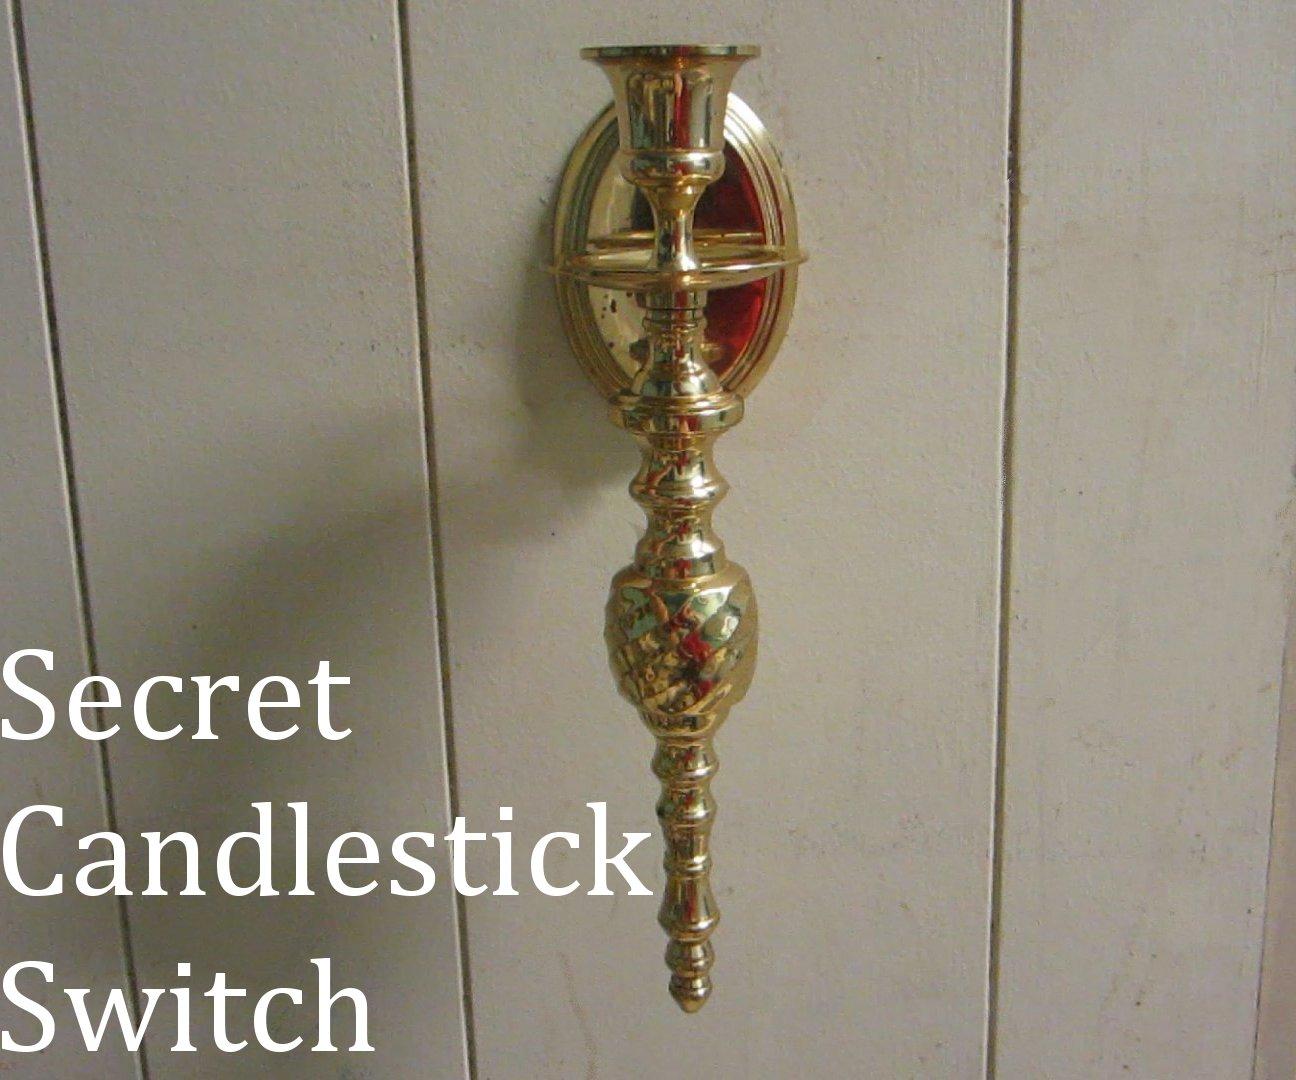 Secret Candlestick Switch